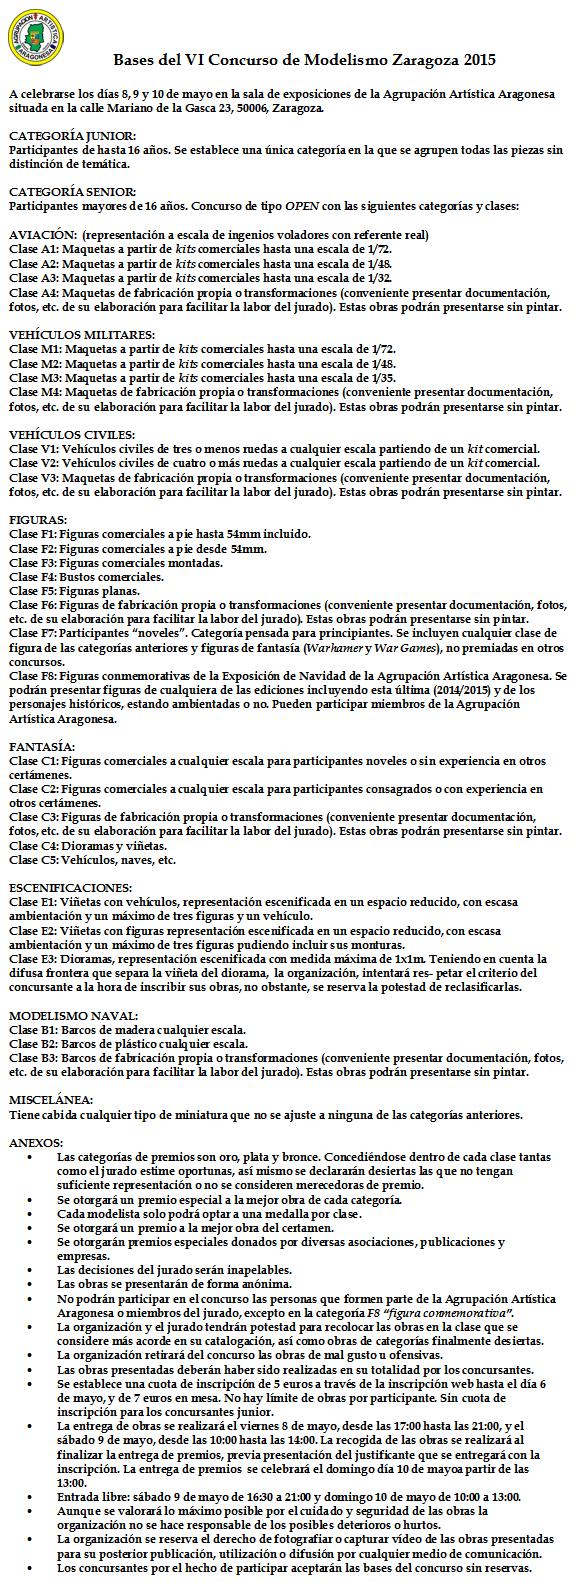 bases-bases-vi-concurso-modelismo-zaragoza-2015-03-578x1582